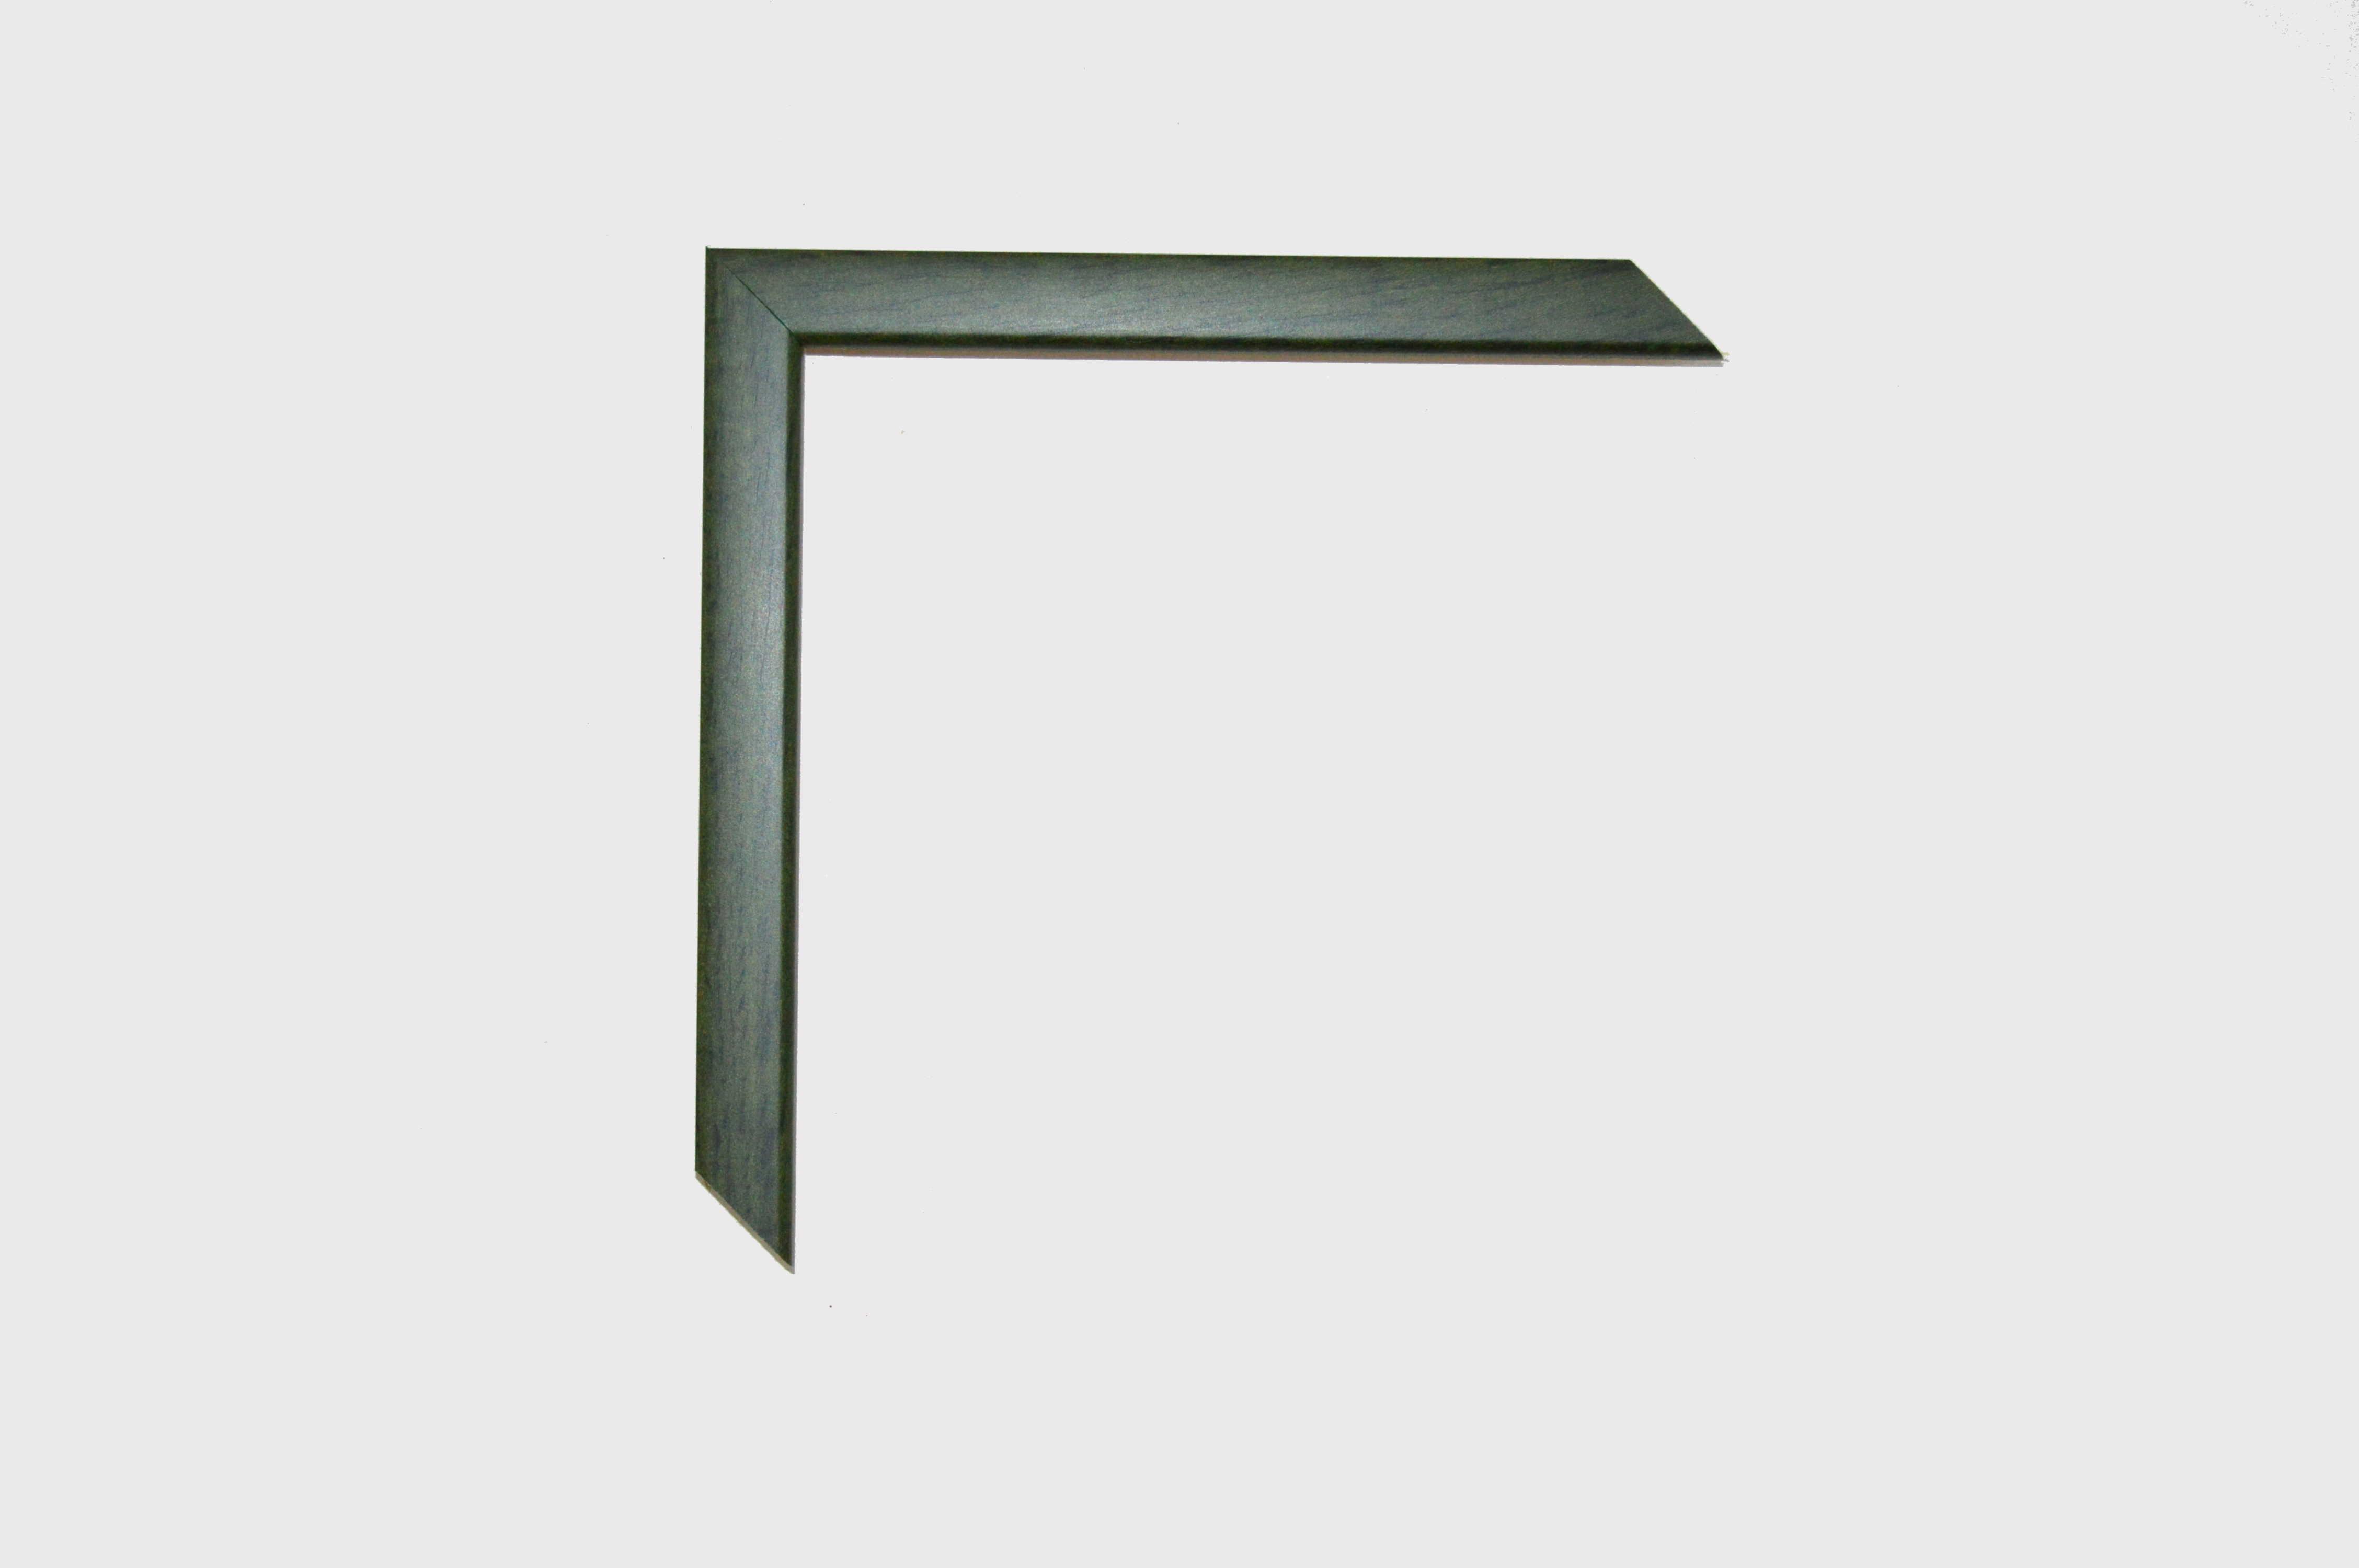 00290-800-VERDE-ancho1.8cm